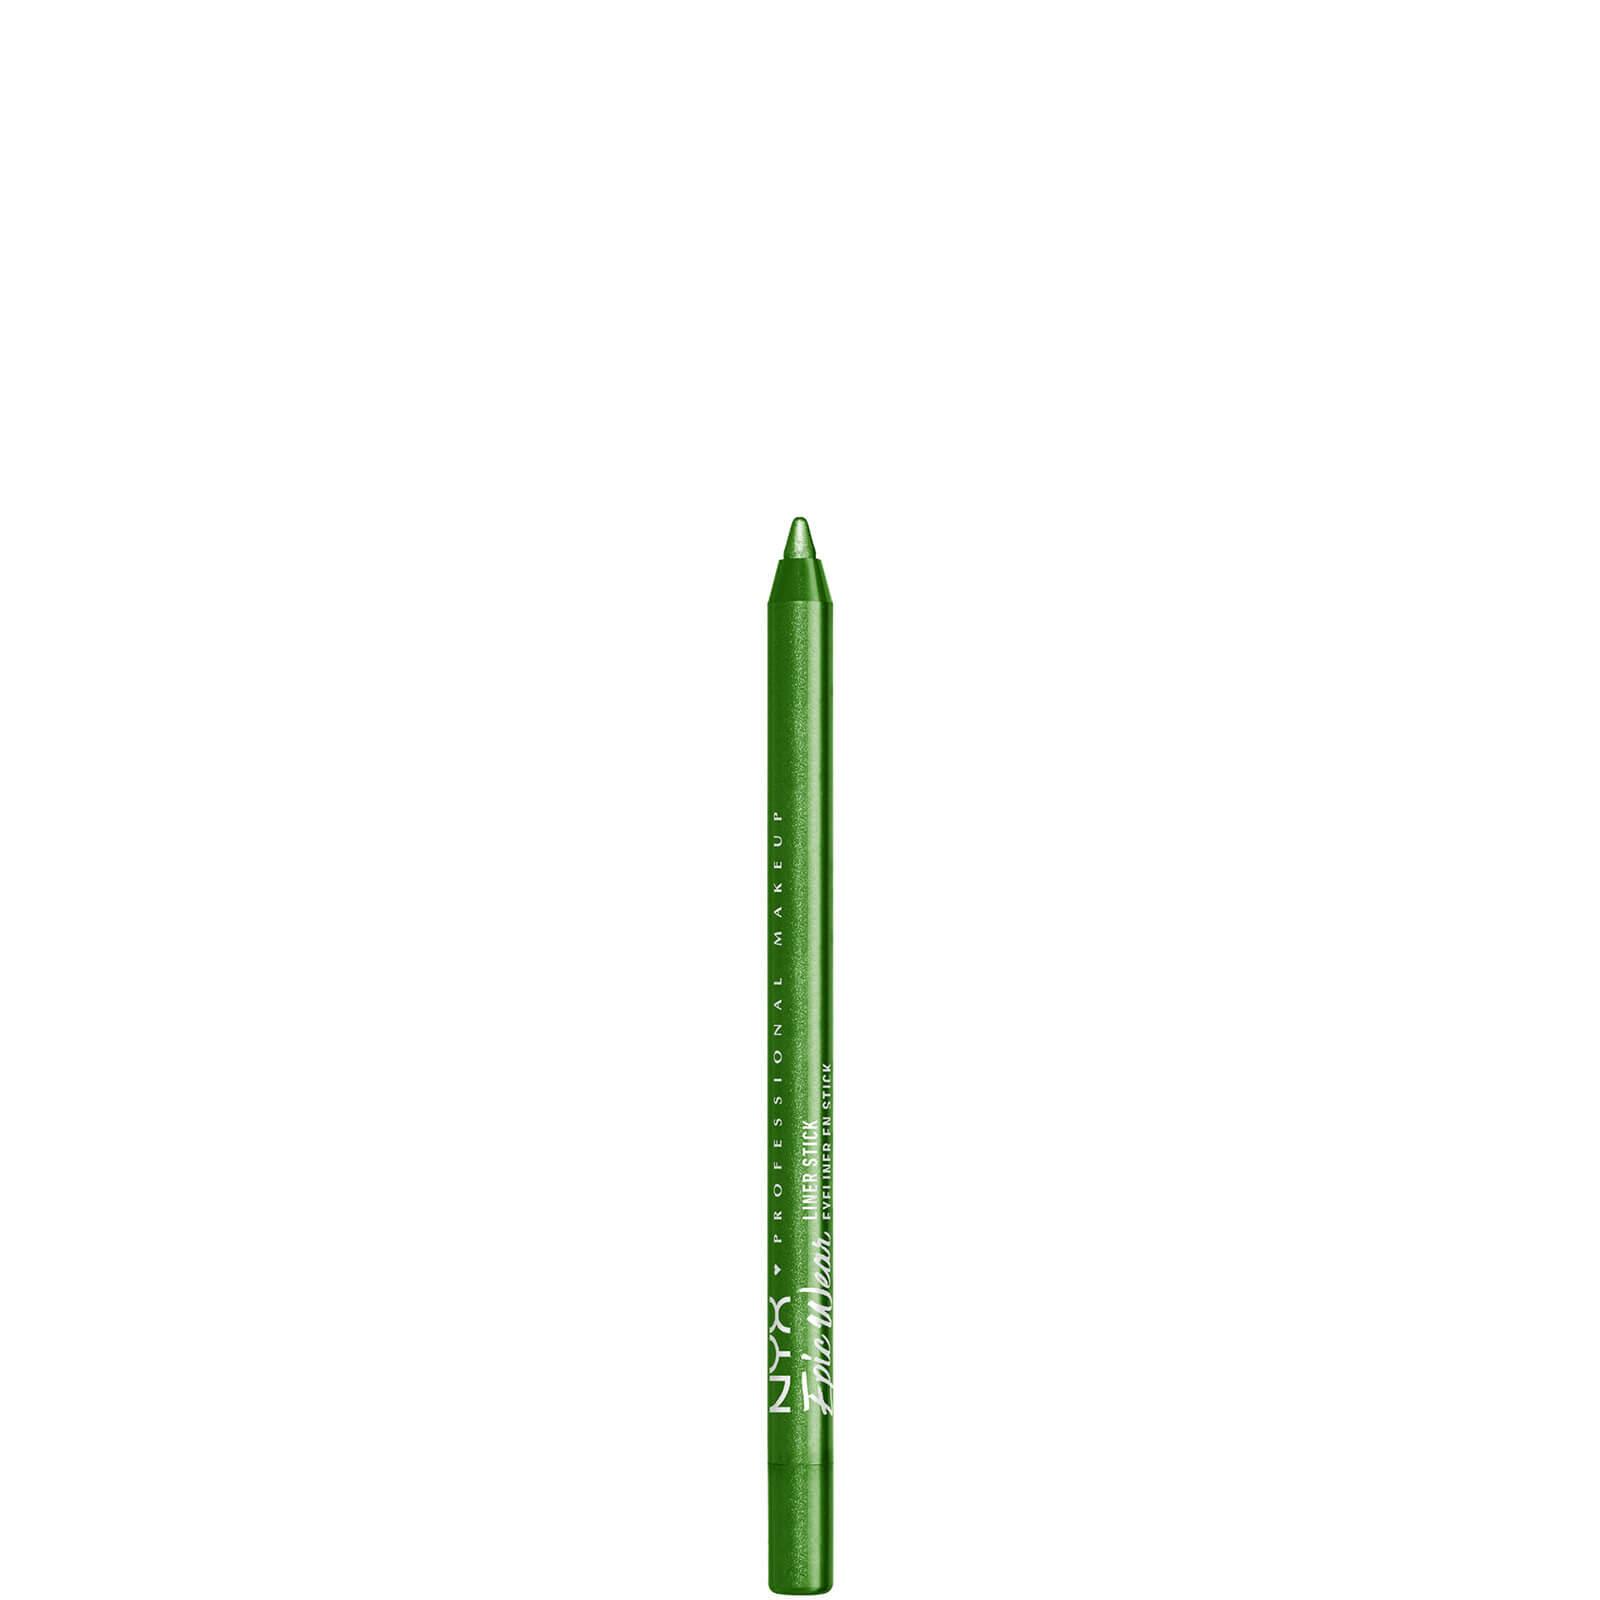 NYX Professional Makeup Epic Wear Long Lasting Liner Stick 1.22g (Various Shades) - Emerald Cut